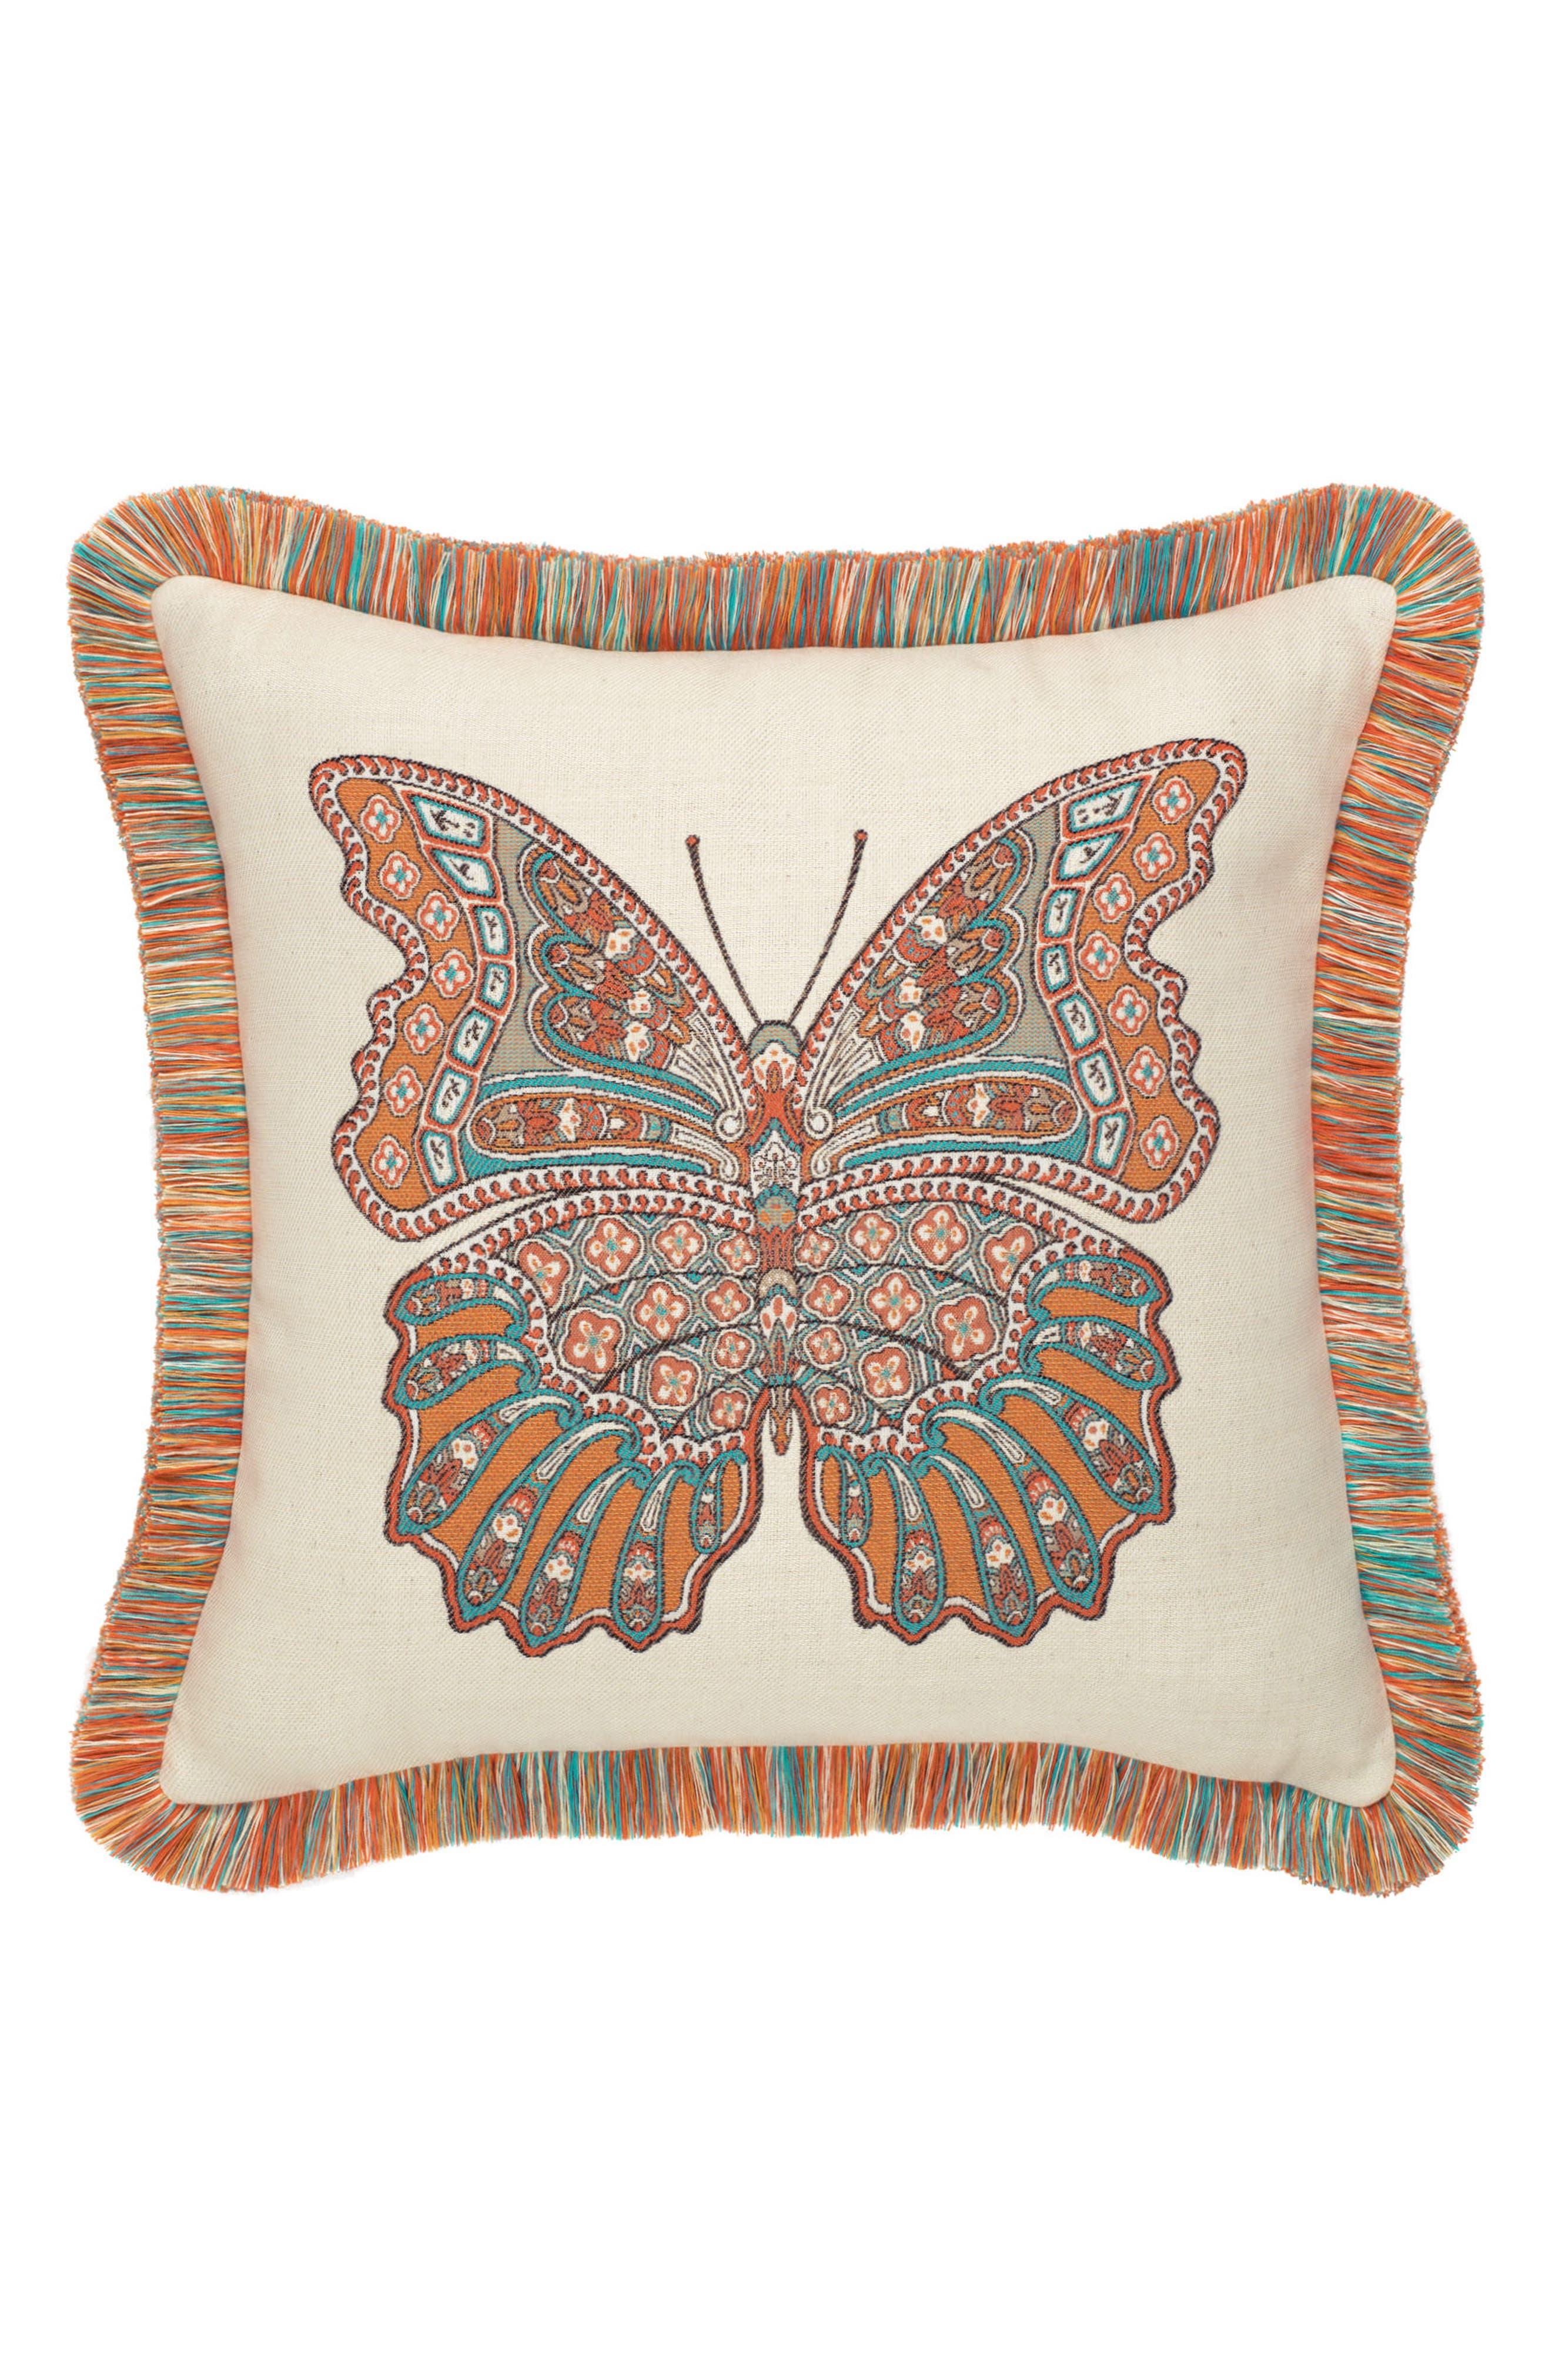 Mariposa Lagoon Indoor/Outdoor Accent Pillow,                             Main thumbnail 1, color,                             Orange/ Ivory